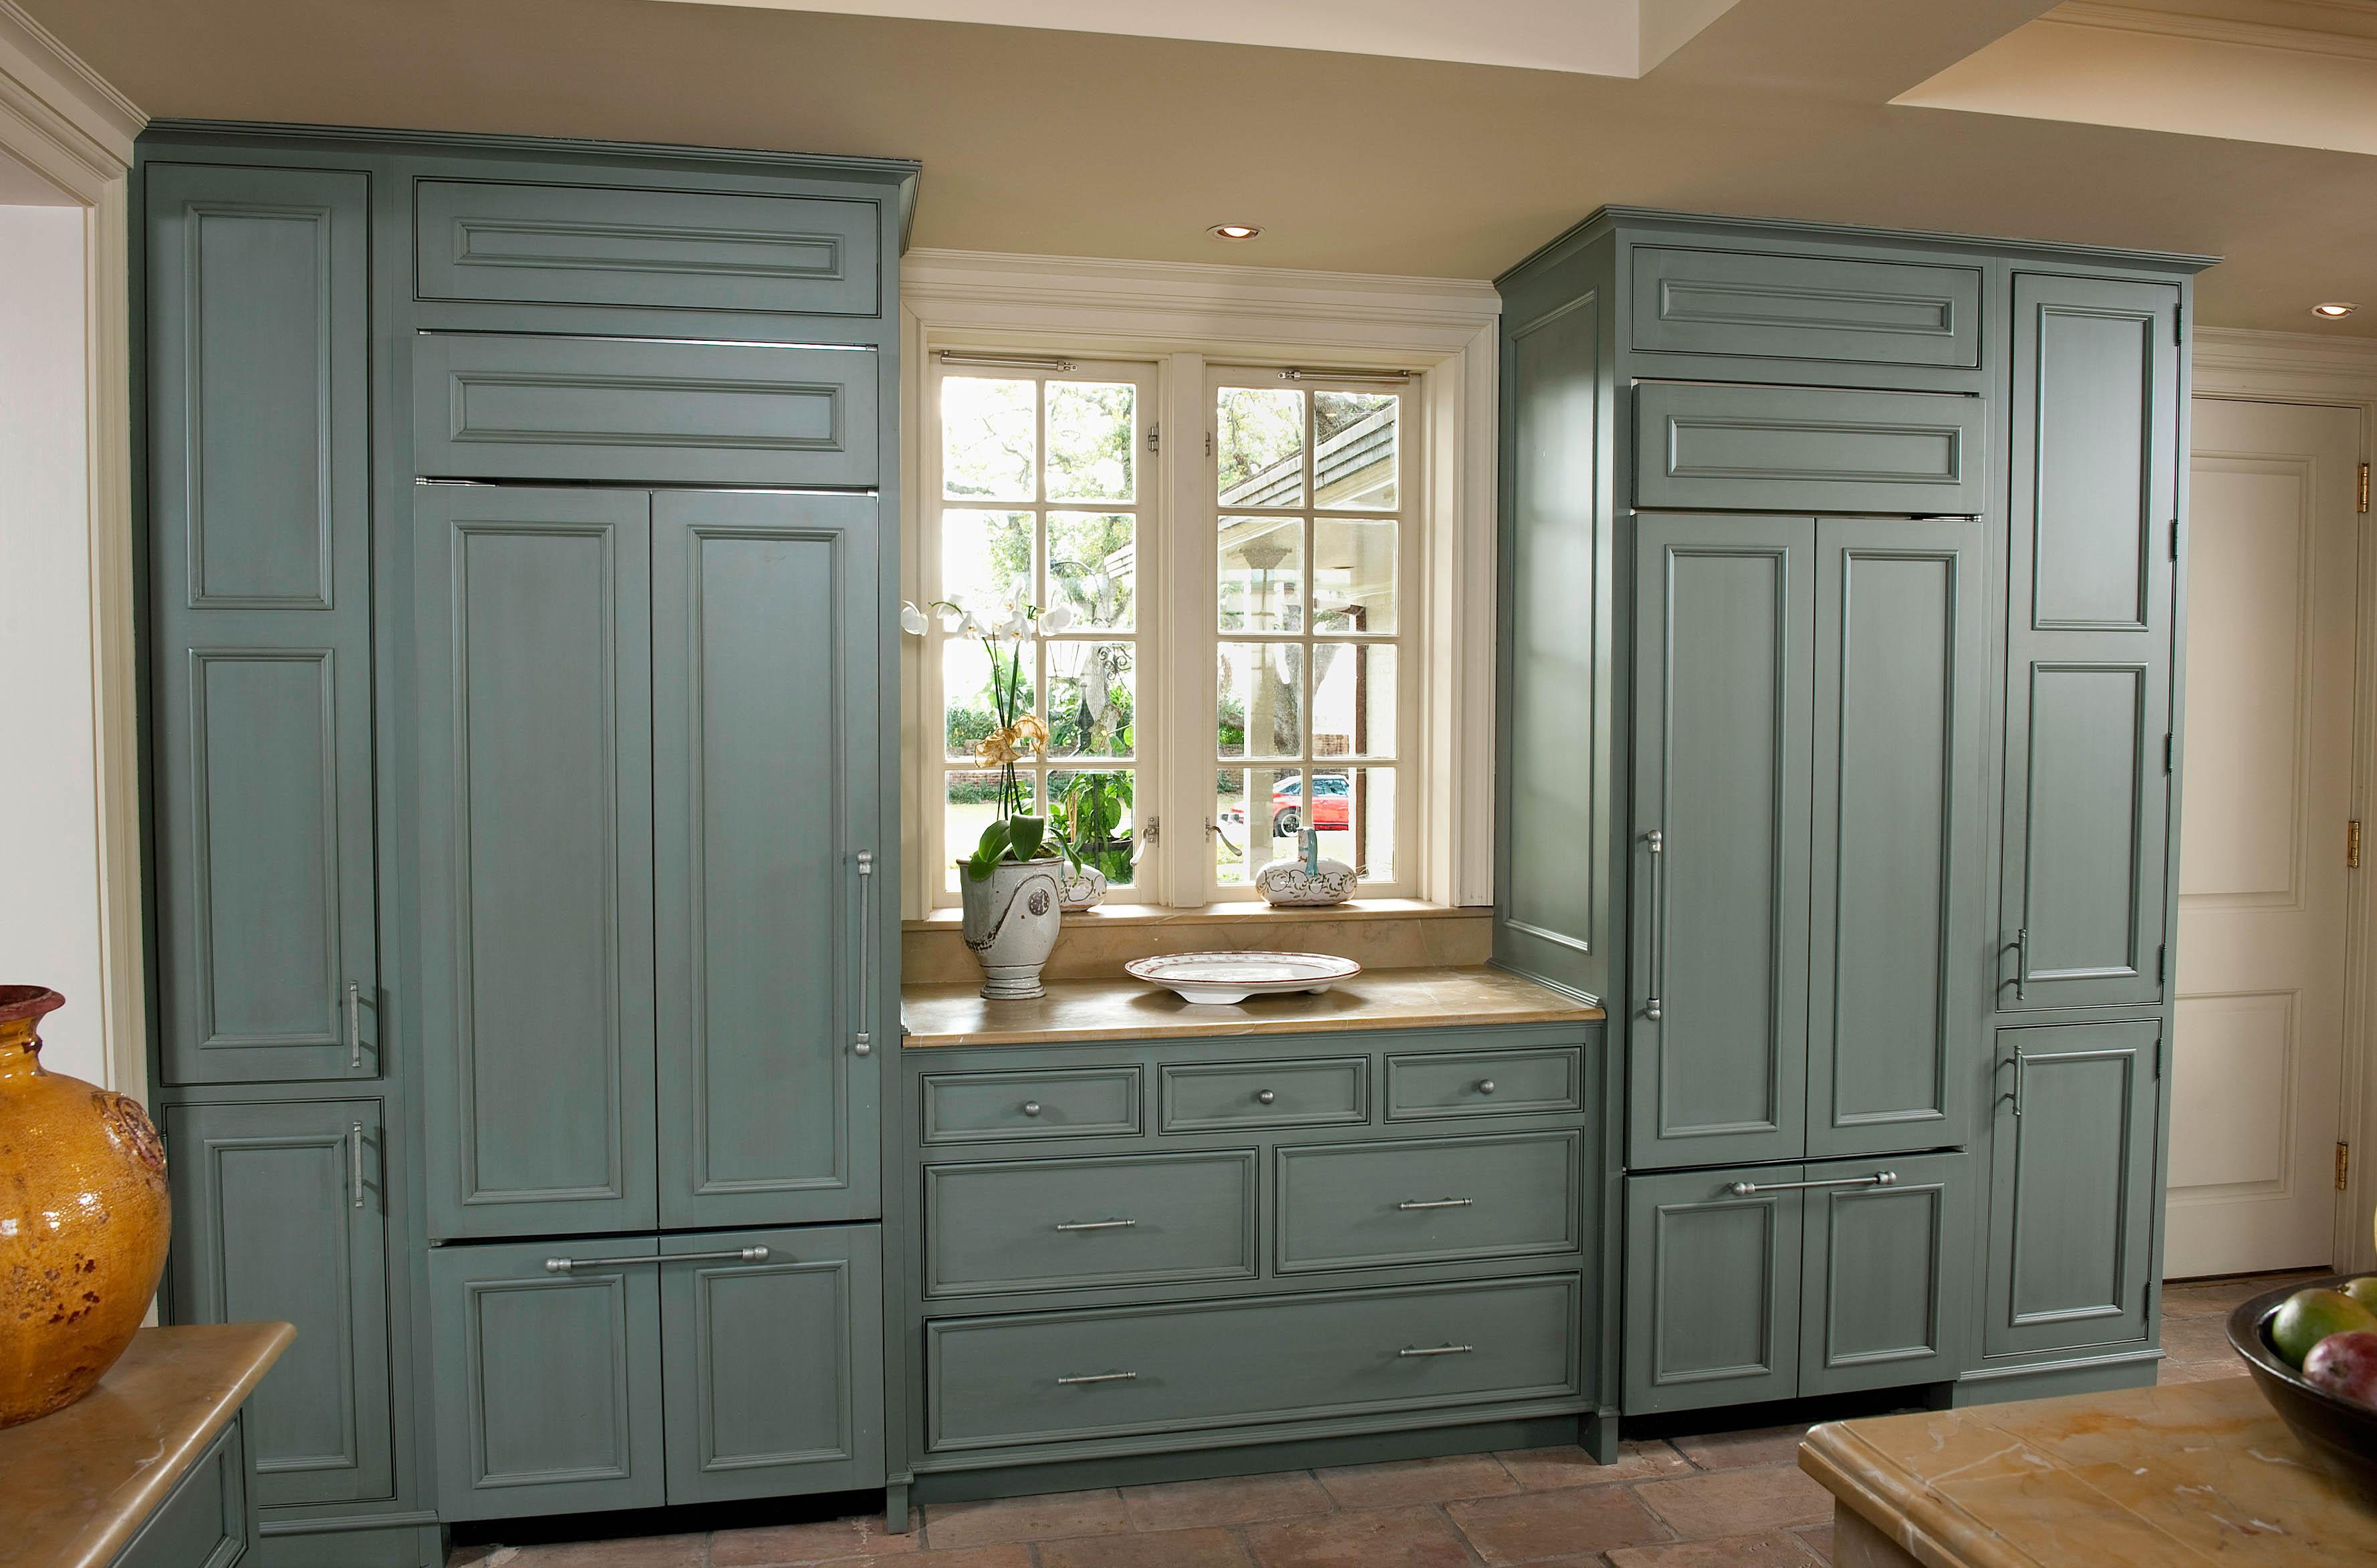 Old Metairie Kitchen_8753 149